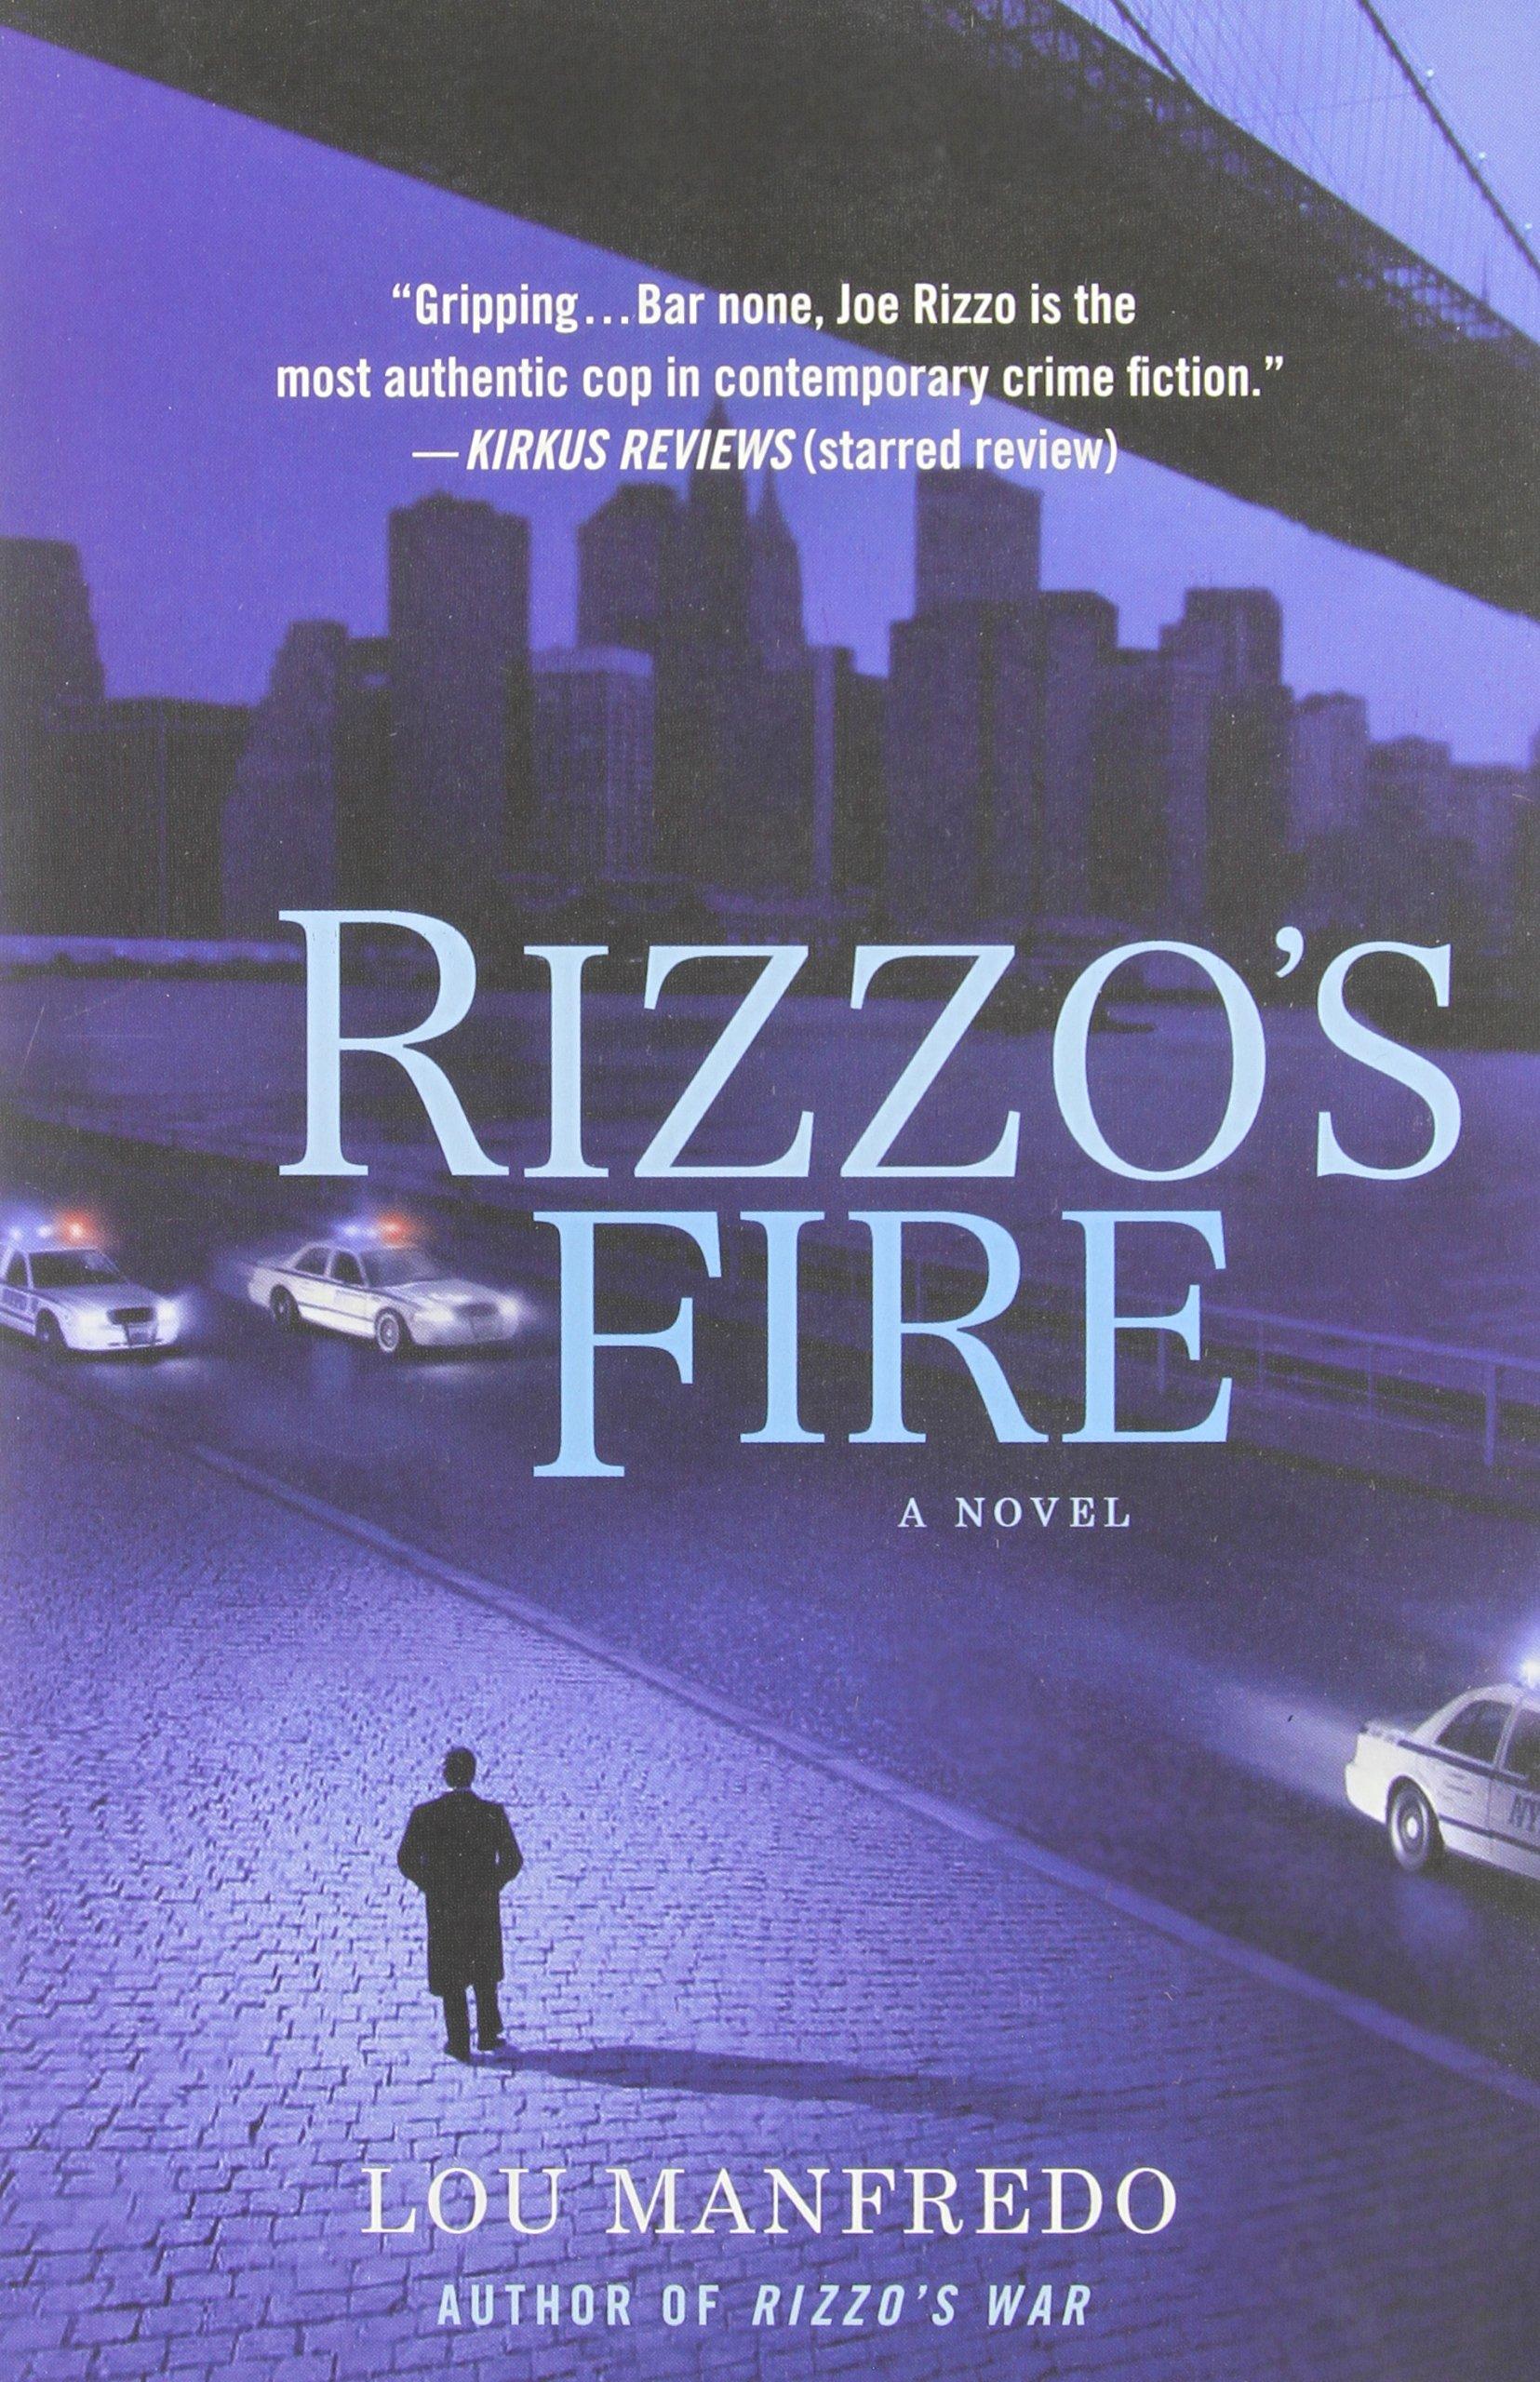 Rizzos Fire